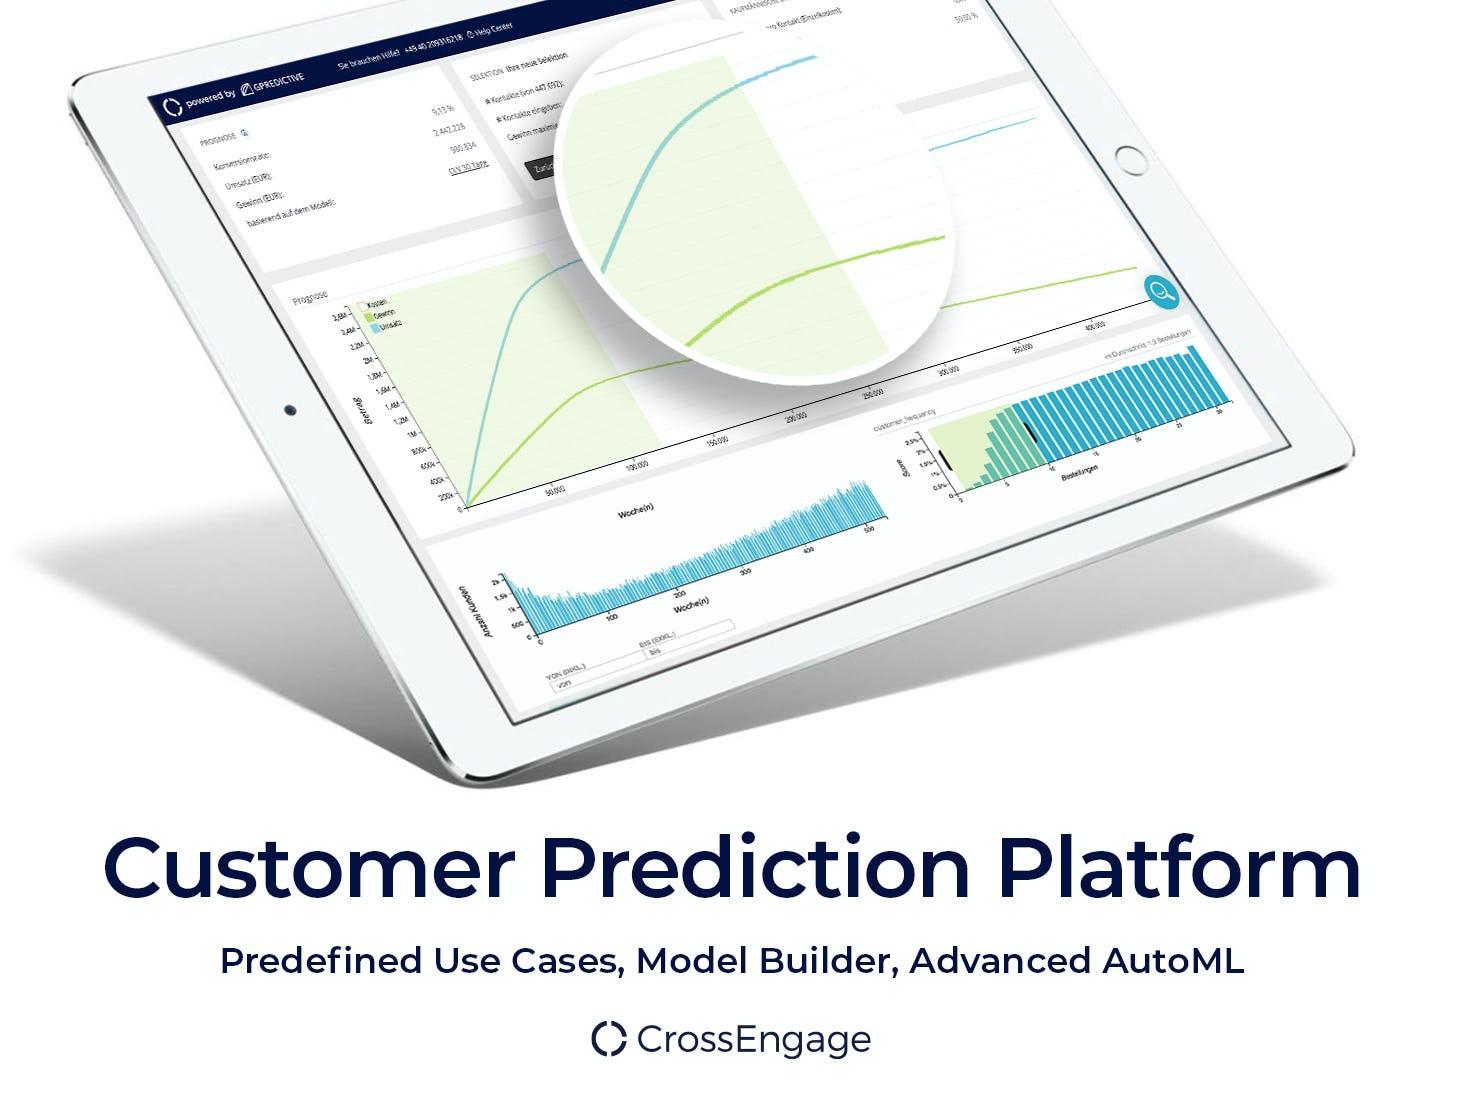 CrossEngage Software - Customer Prediction Platform